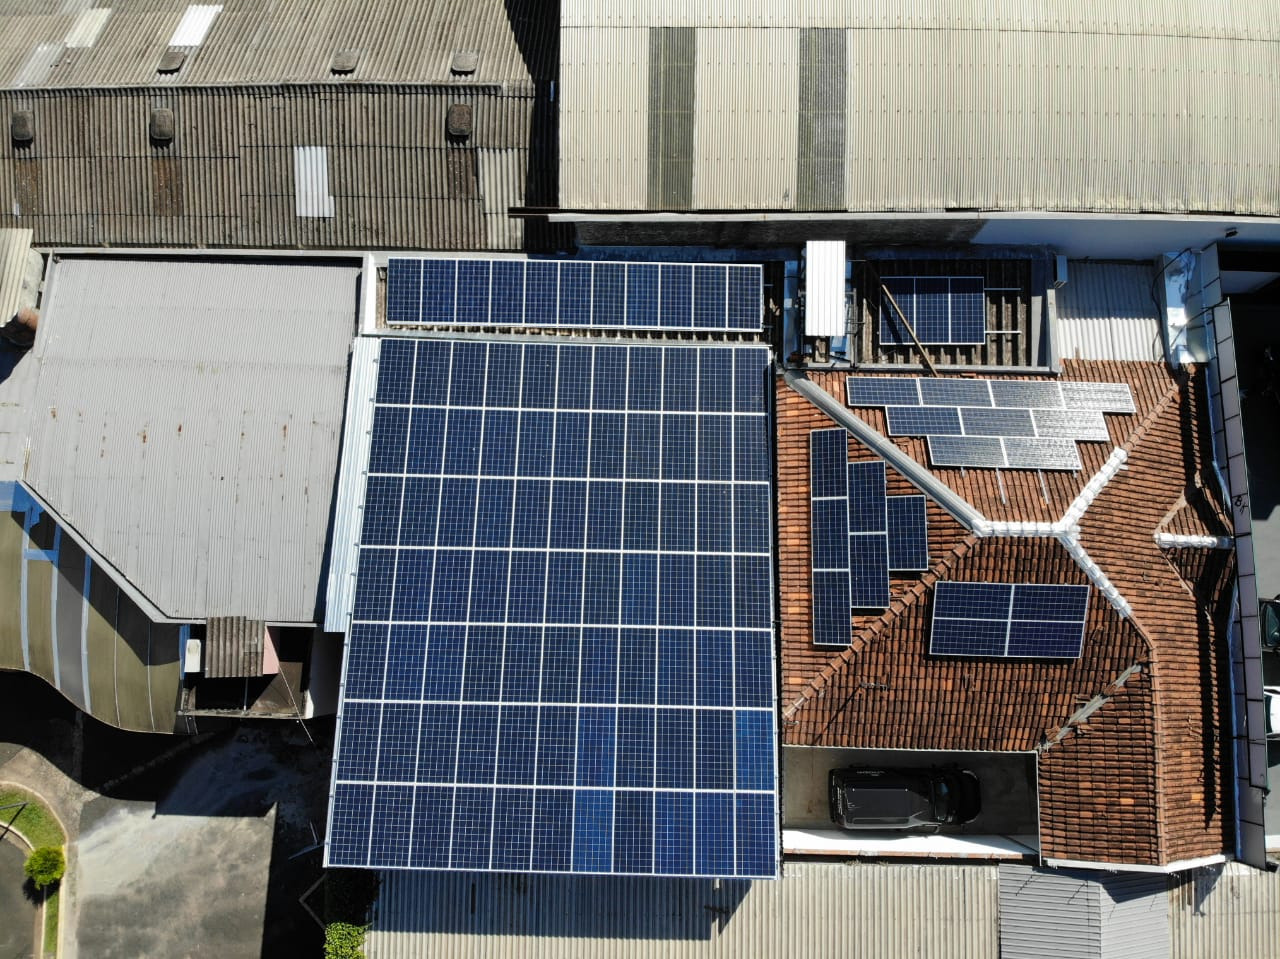 echopp-energia-solar-fotovoltaica-araraquara-sao-carlos-matao3